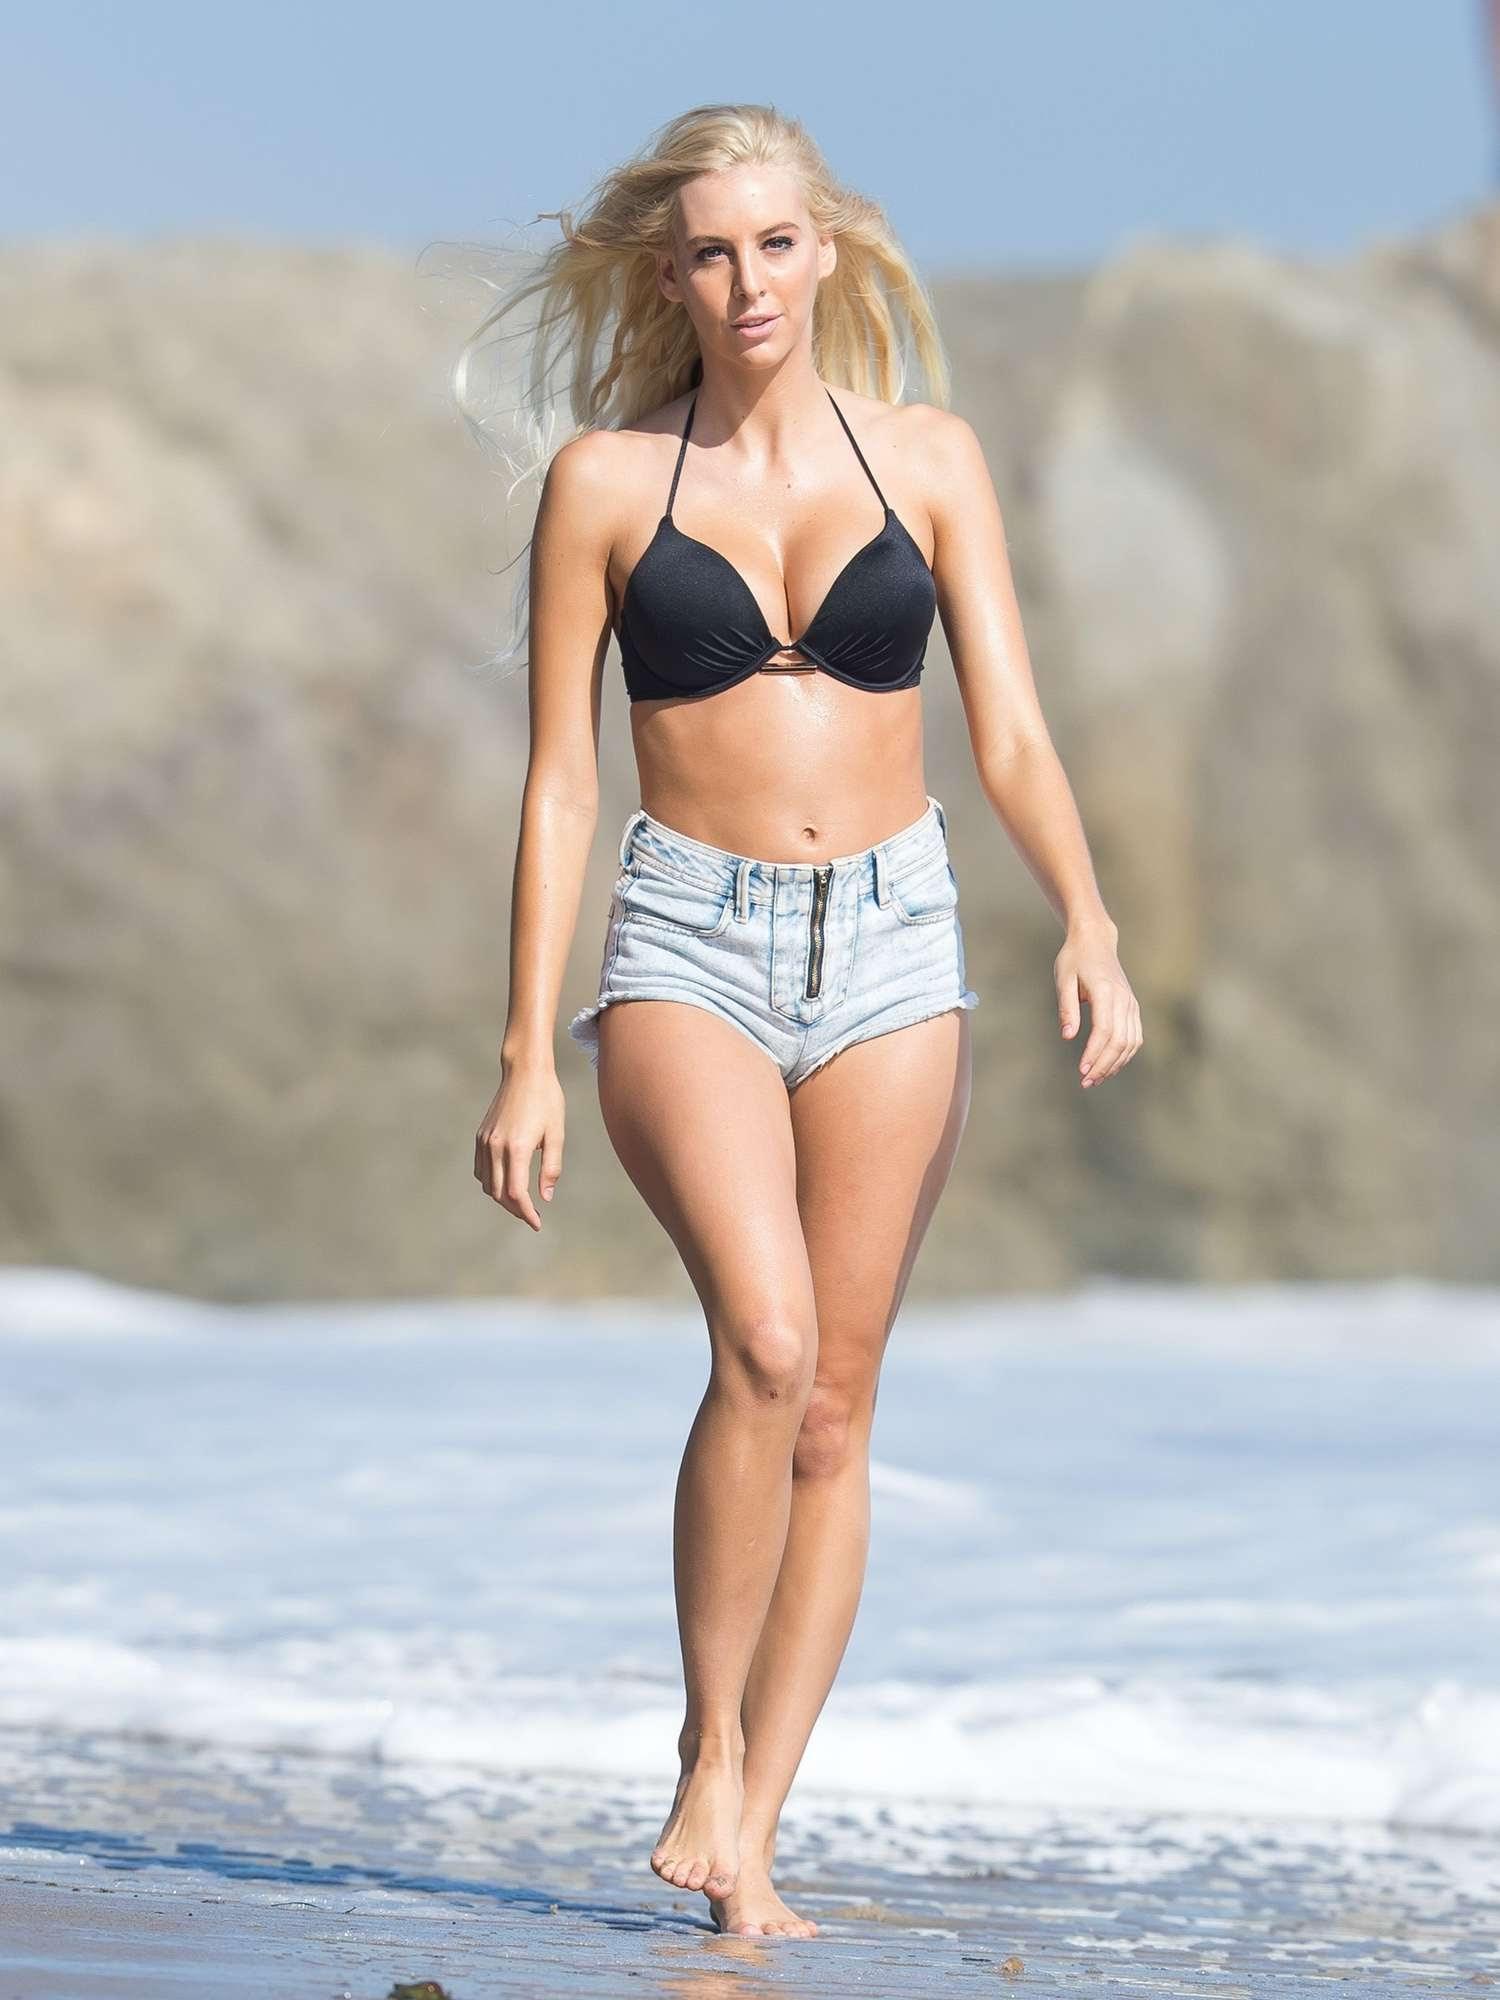 Celebrites Bri Teresi naked (91 photos), Tits, Leaked, Feet, in bikini 2020